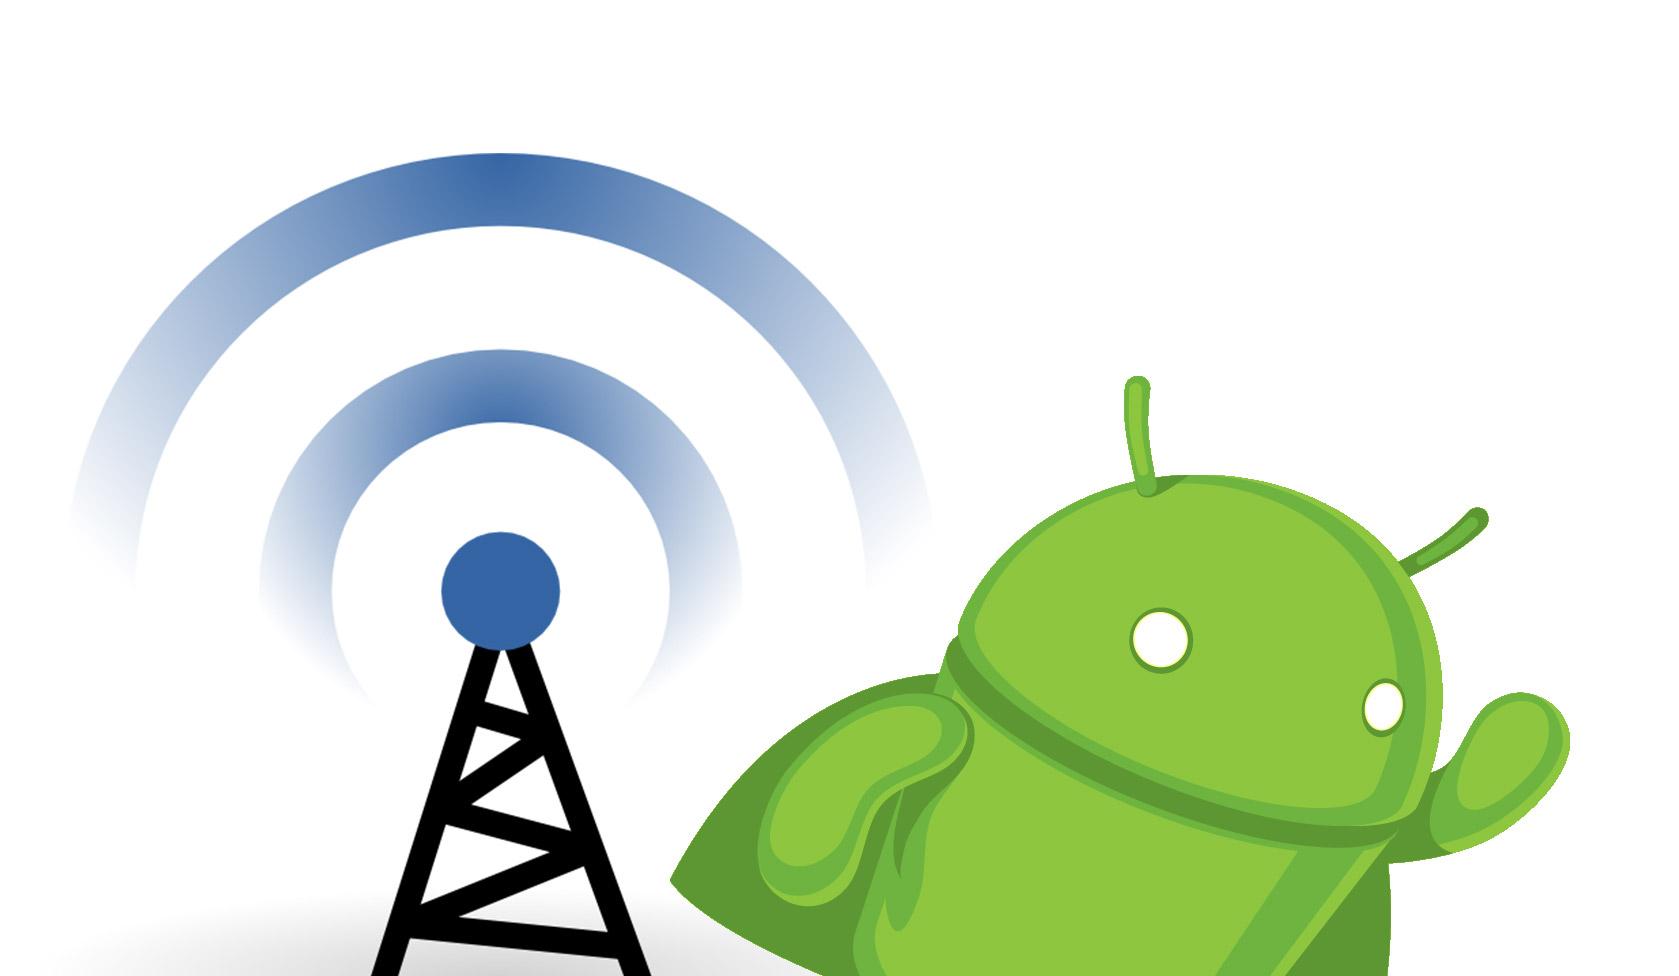 Trucos acelerar 3G